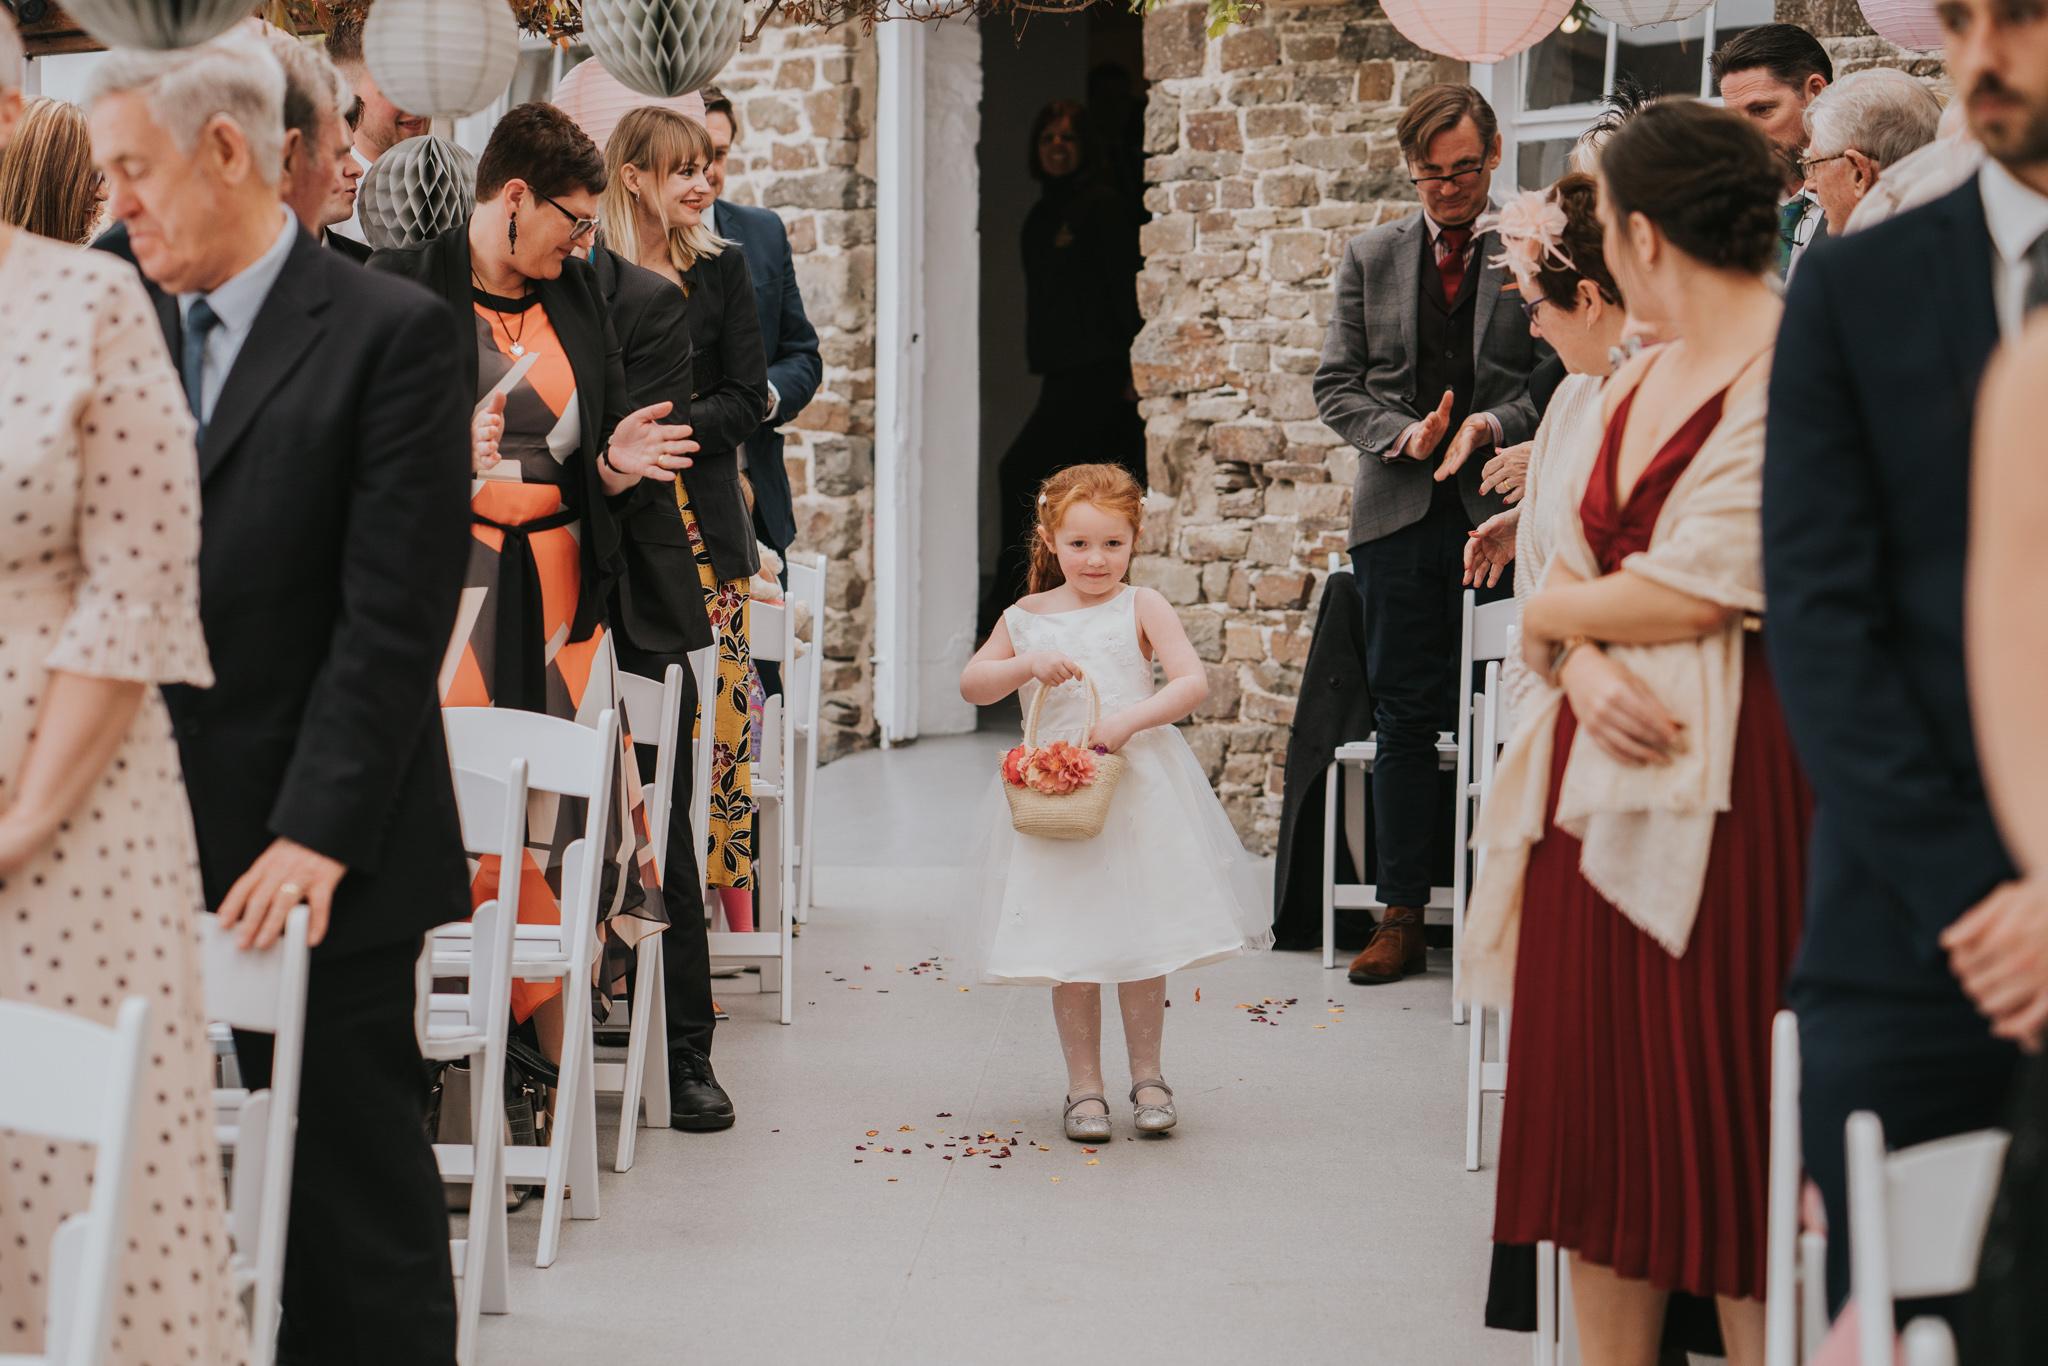 grace-sam-old-barn-clovelly-devon-wedding-photographer-grace-elizabeth-essex-suffolk-norfolk-wedding-photographer (39 of 132).jpg